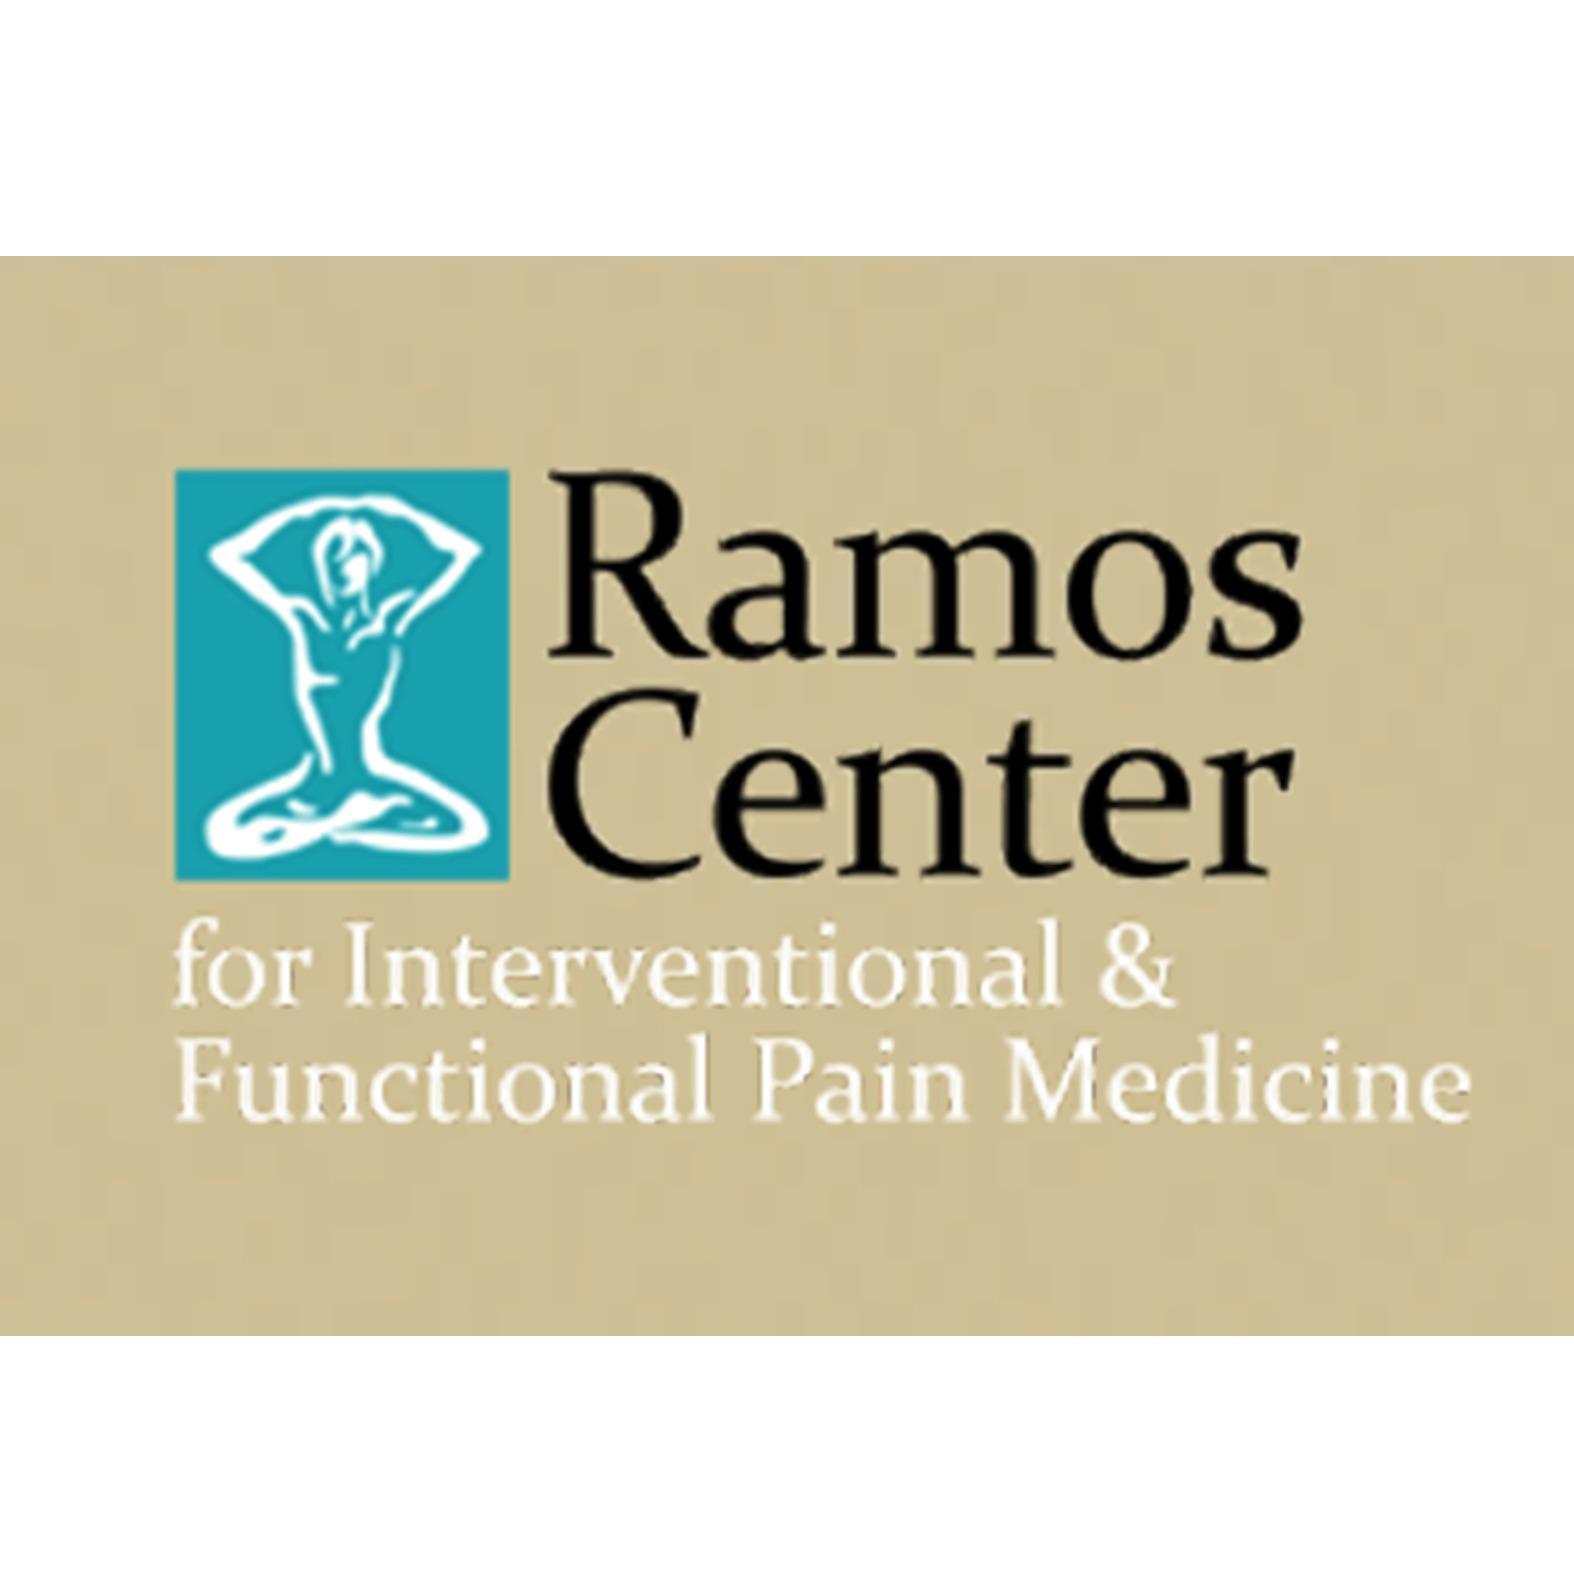 Ramos Center